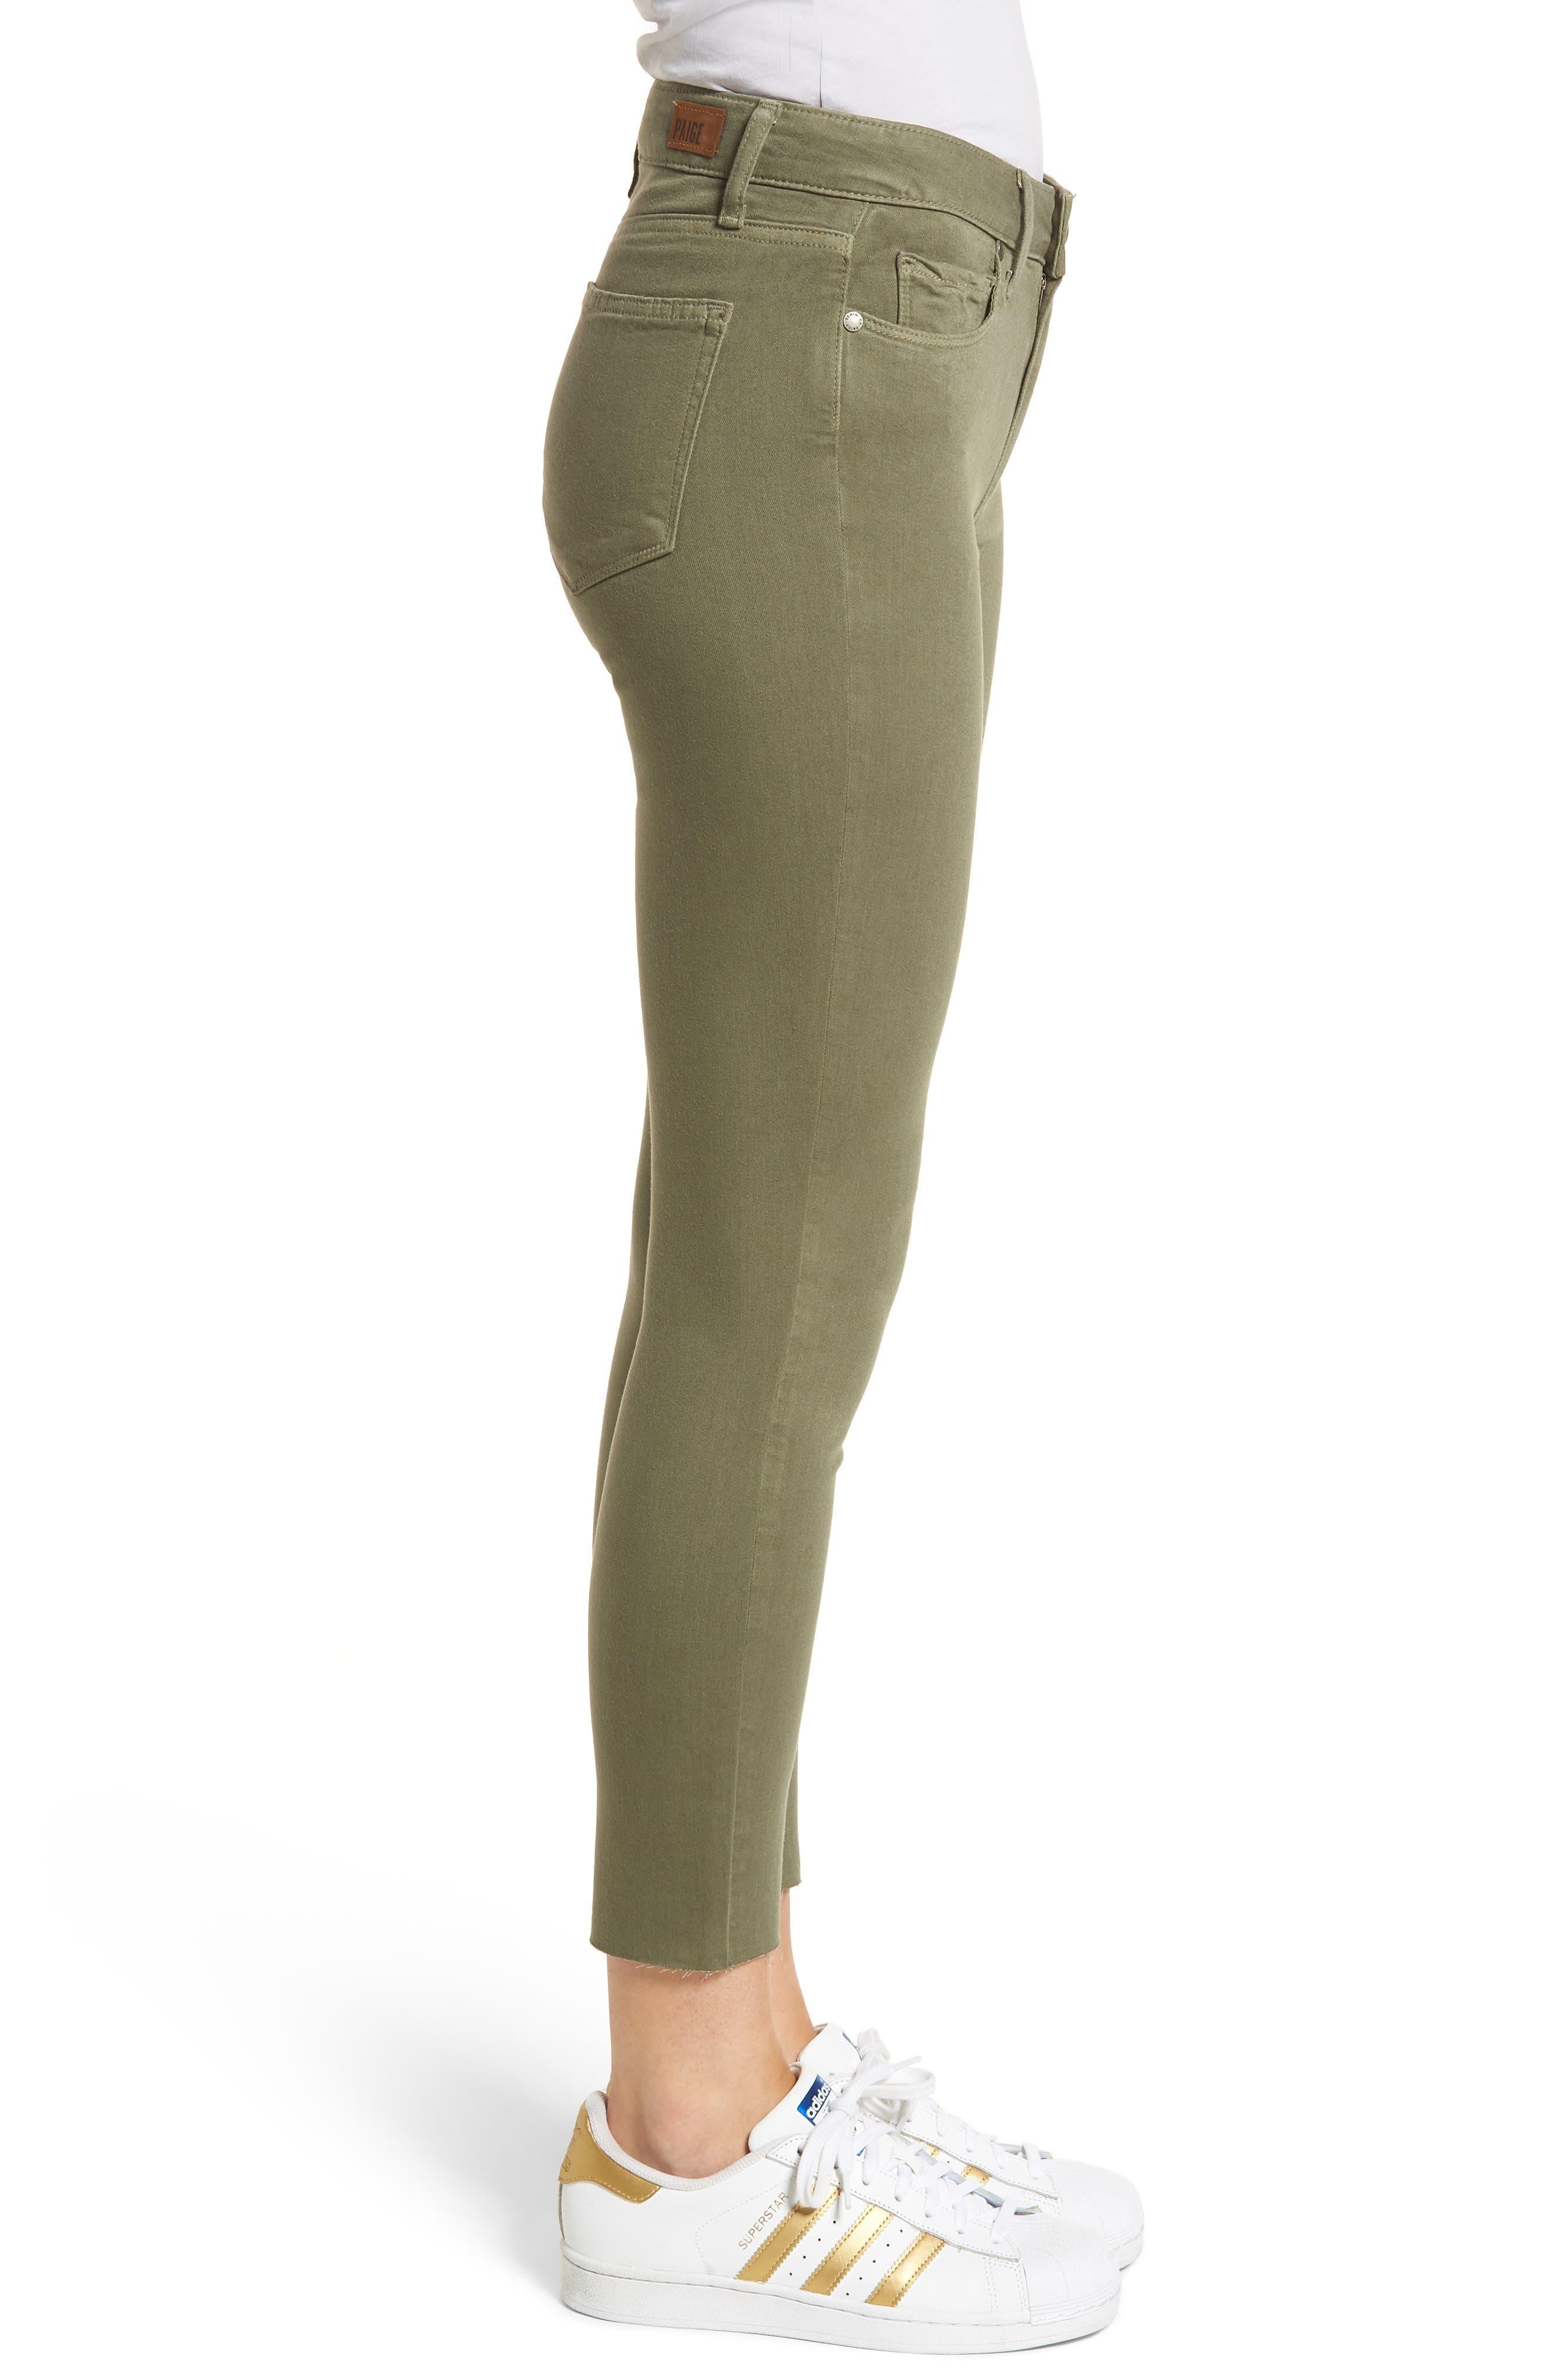 Hoxton High Waist Crop Skinny Jeans,                             Alternate thumbnail 3, color,                             Vintage Green